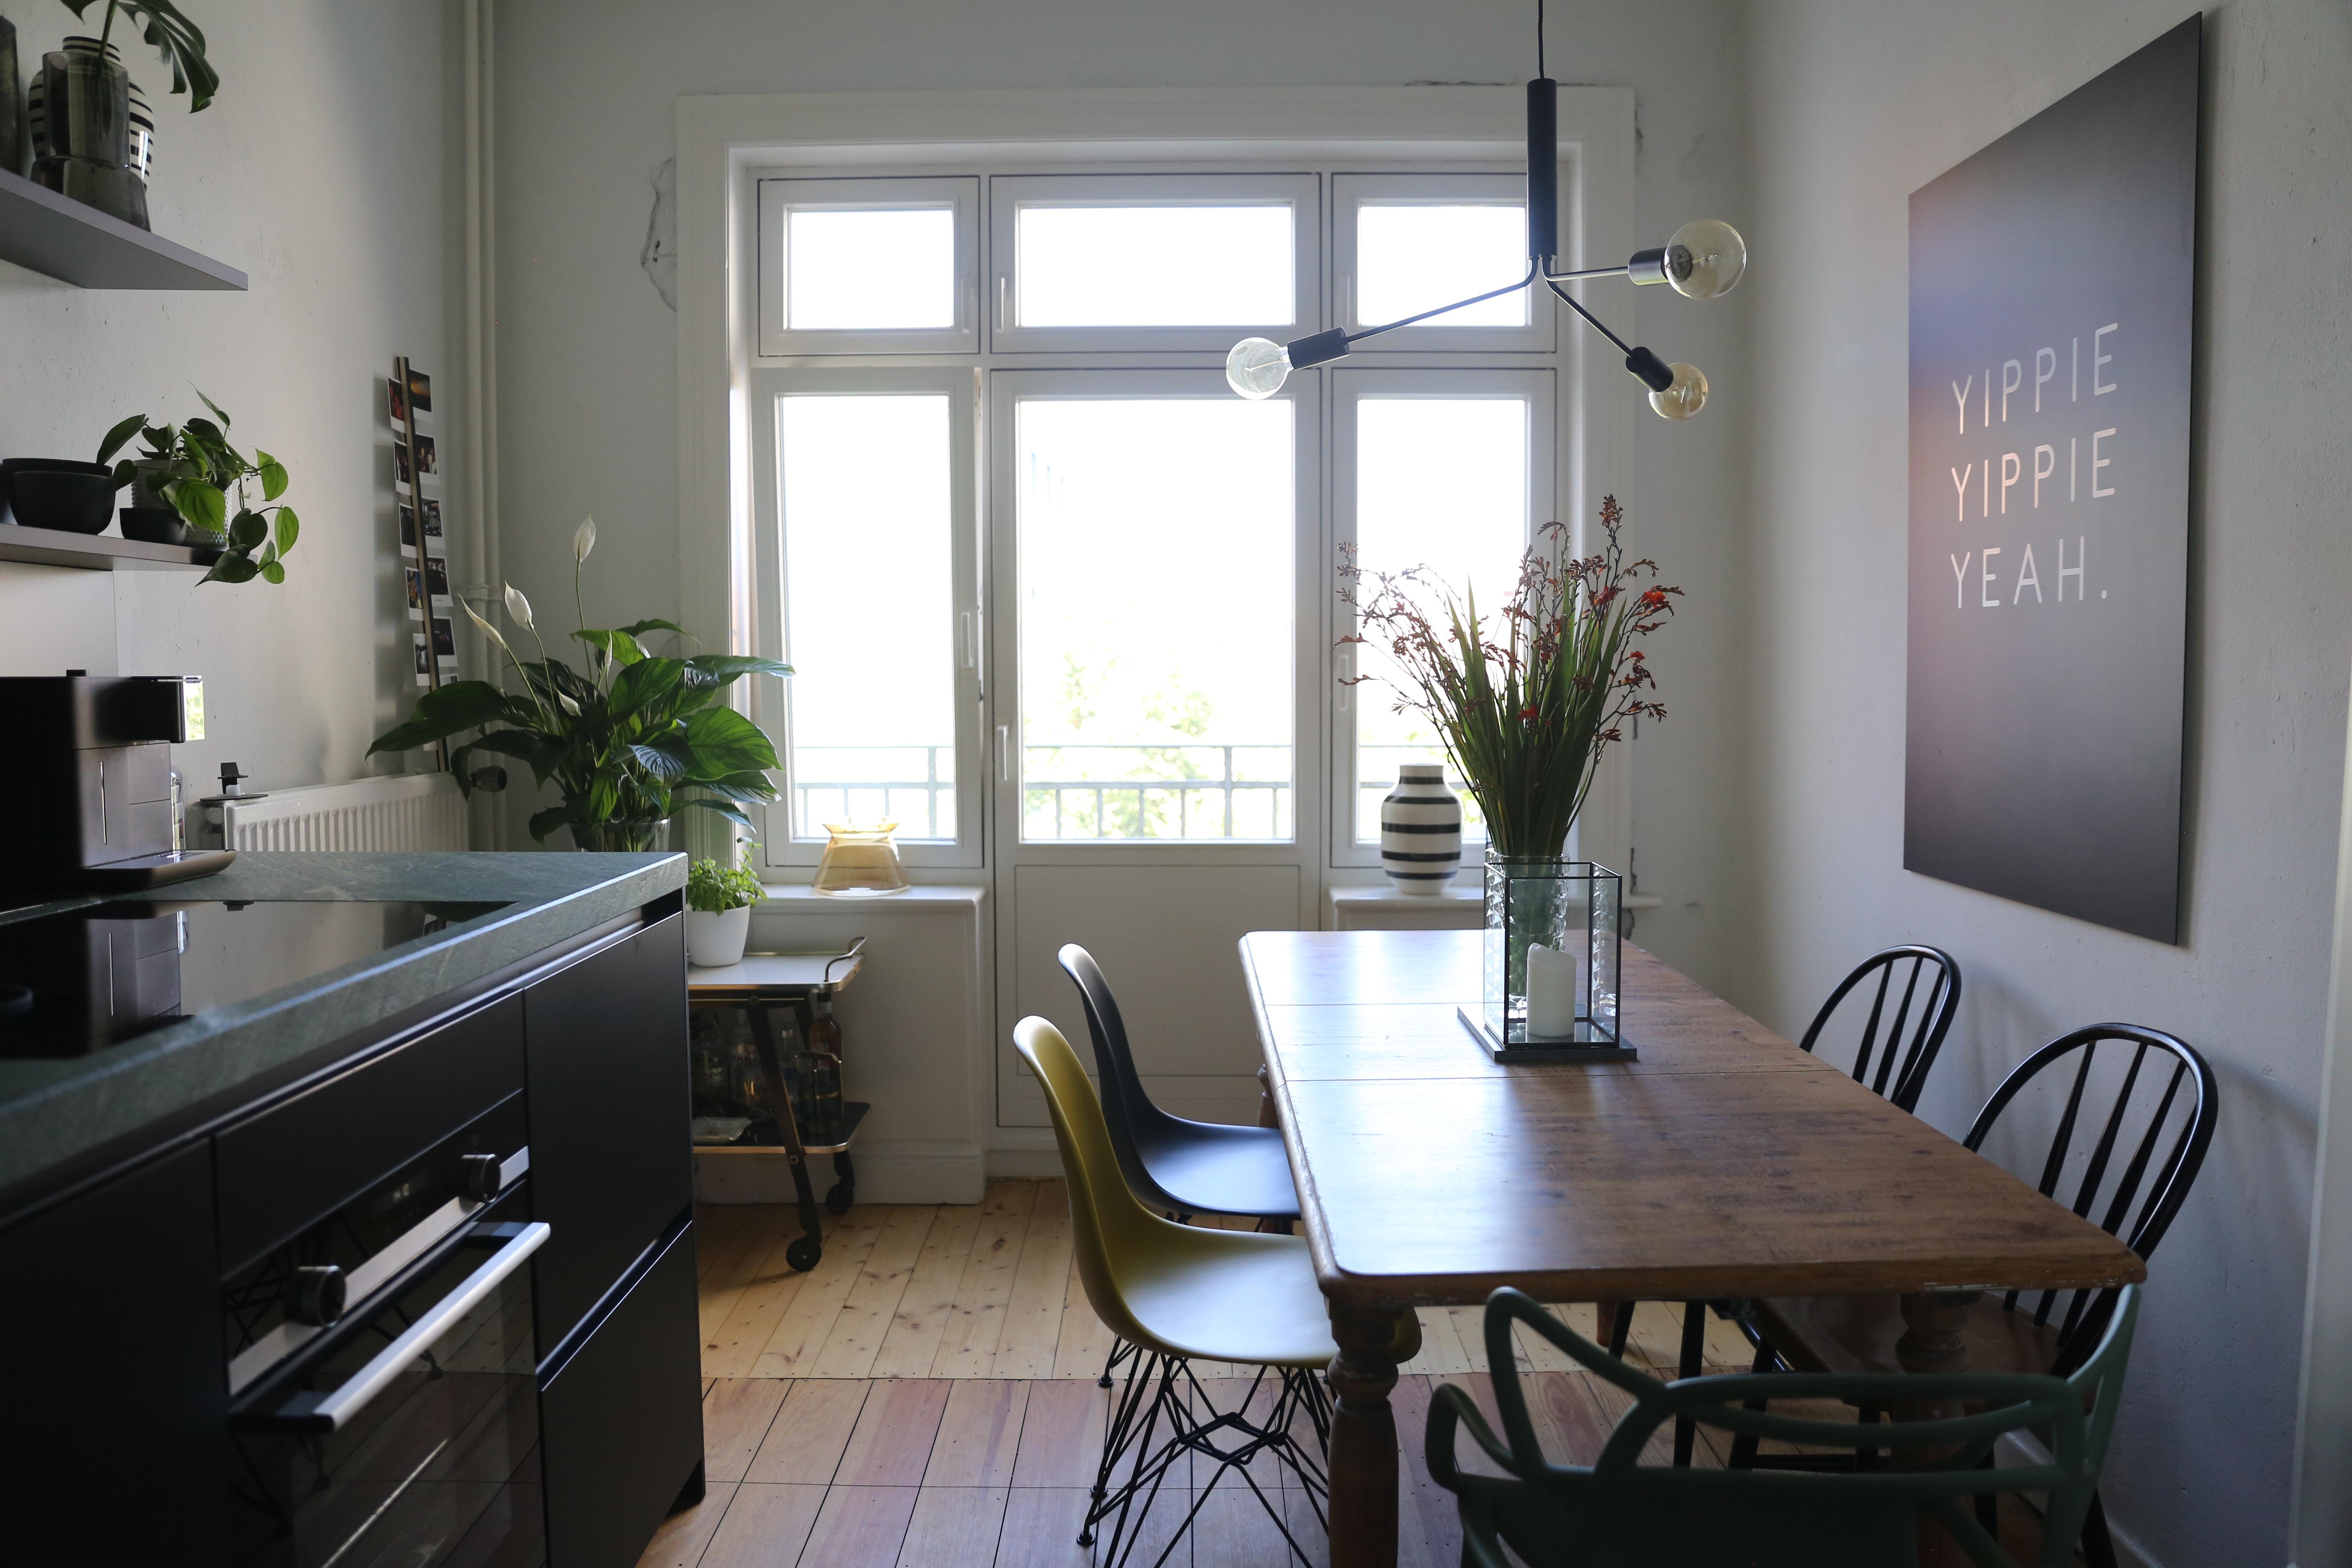 chairmania neue klassiker f r die k che elbgestoeber. Black Bedroom Furniture Sets. Home Design Ideas